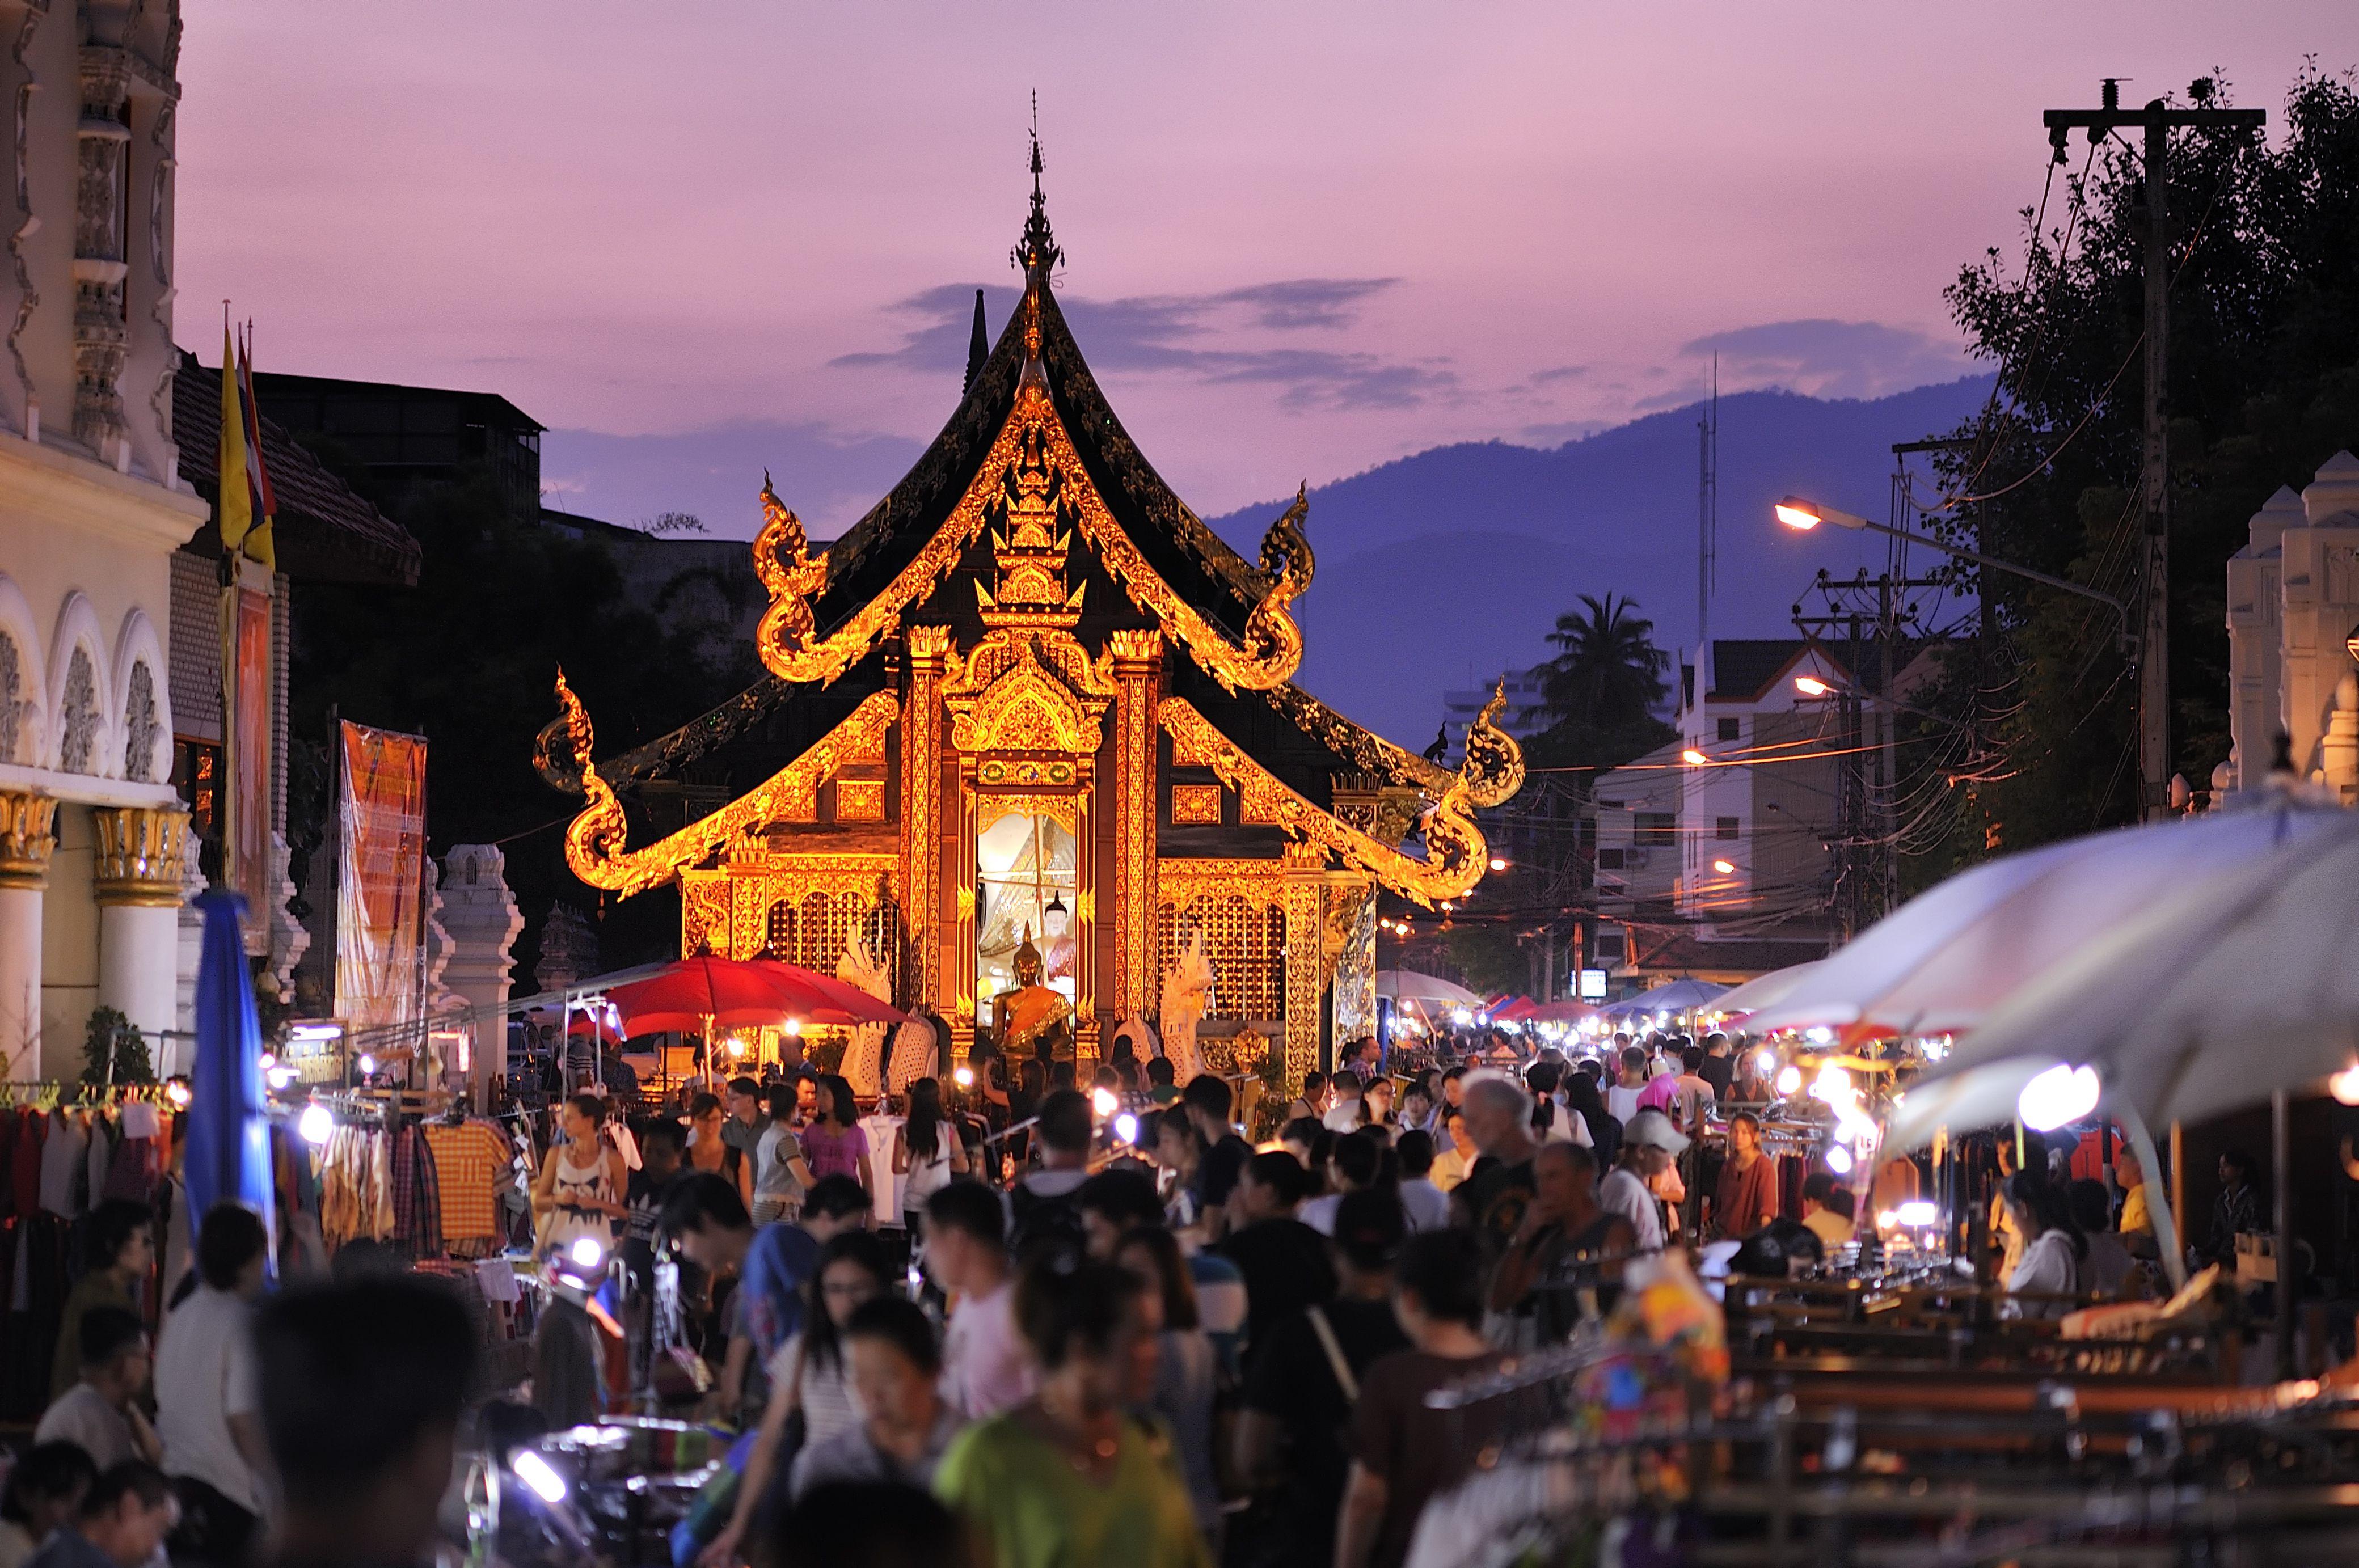 Sunday market walking street in Chiang Mai, Thailand